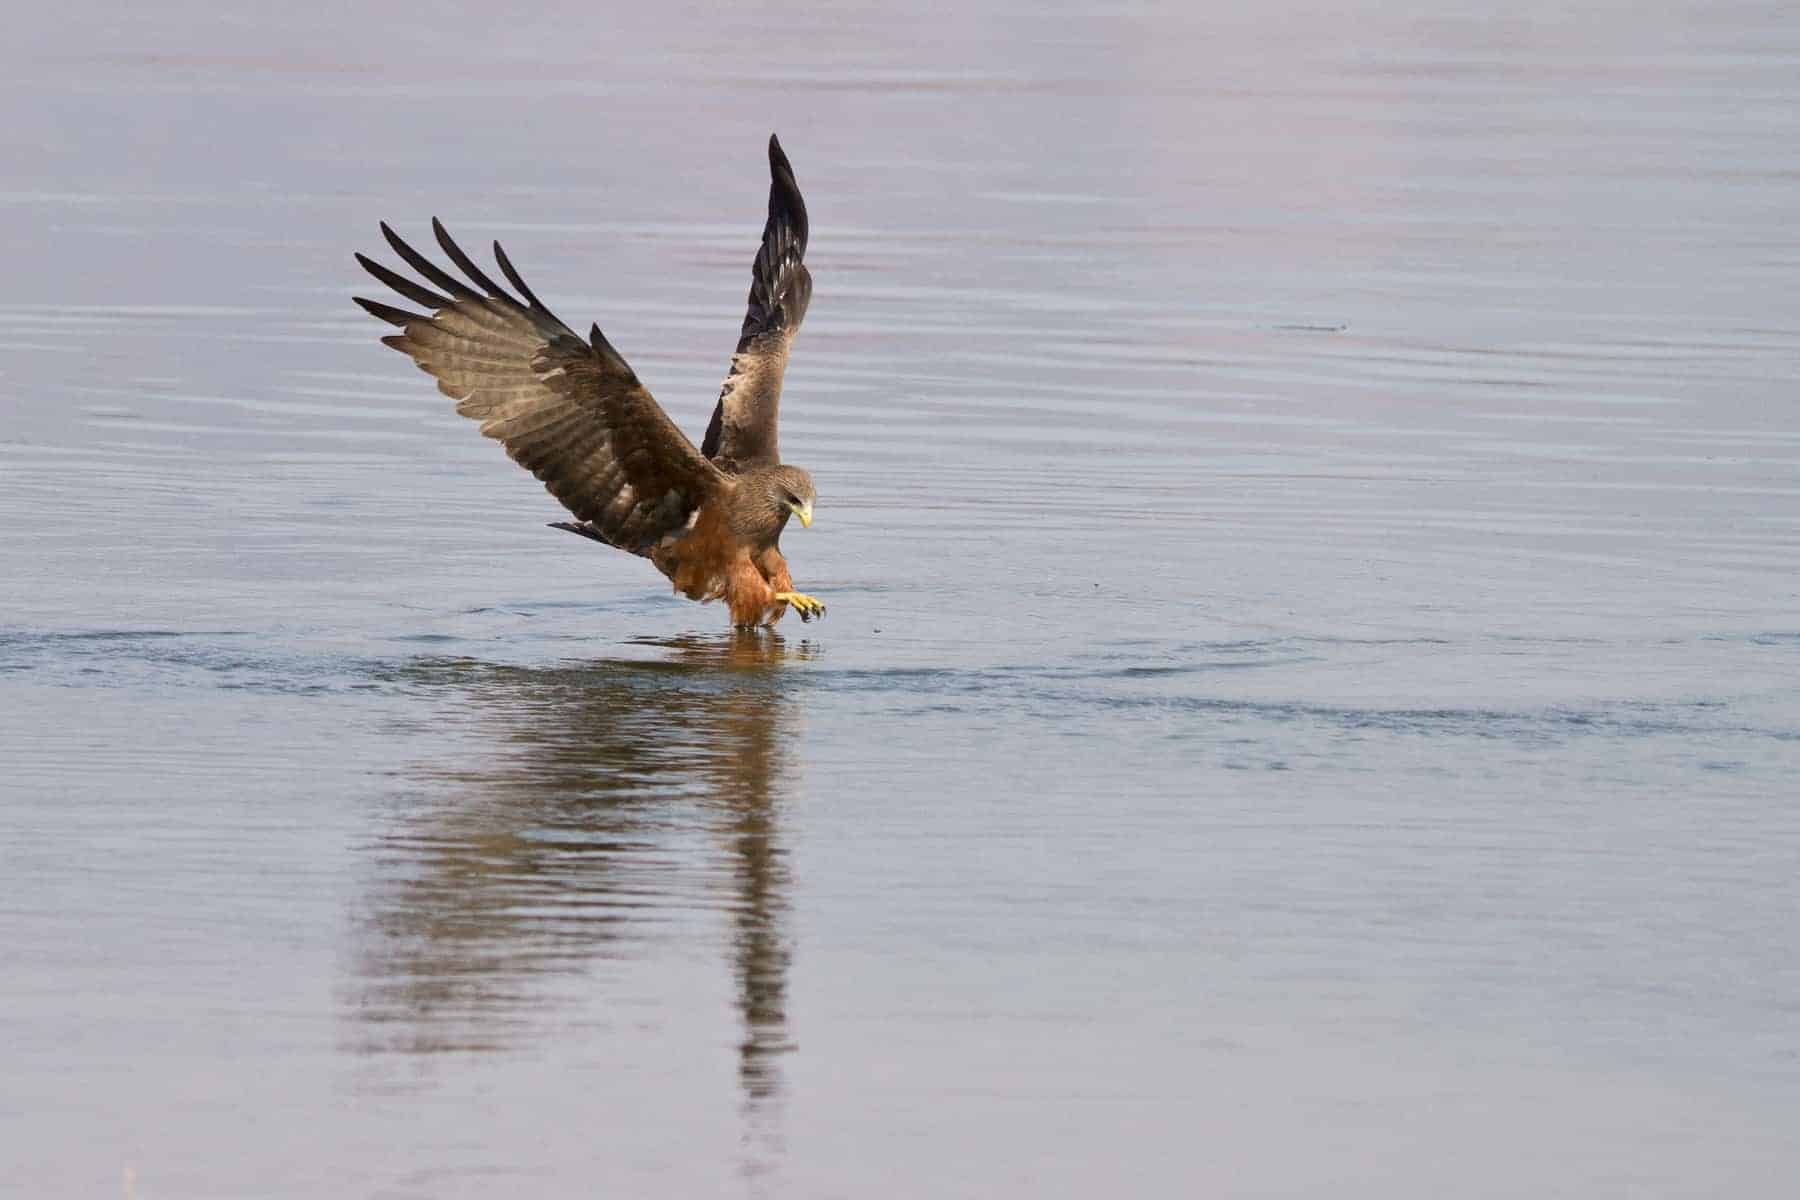 Safari i afrika: Zambia, Mana, Black kite på fisketur